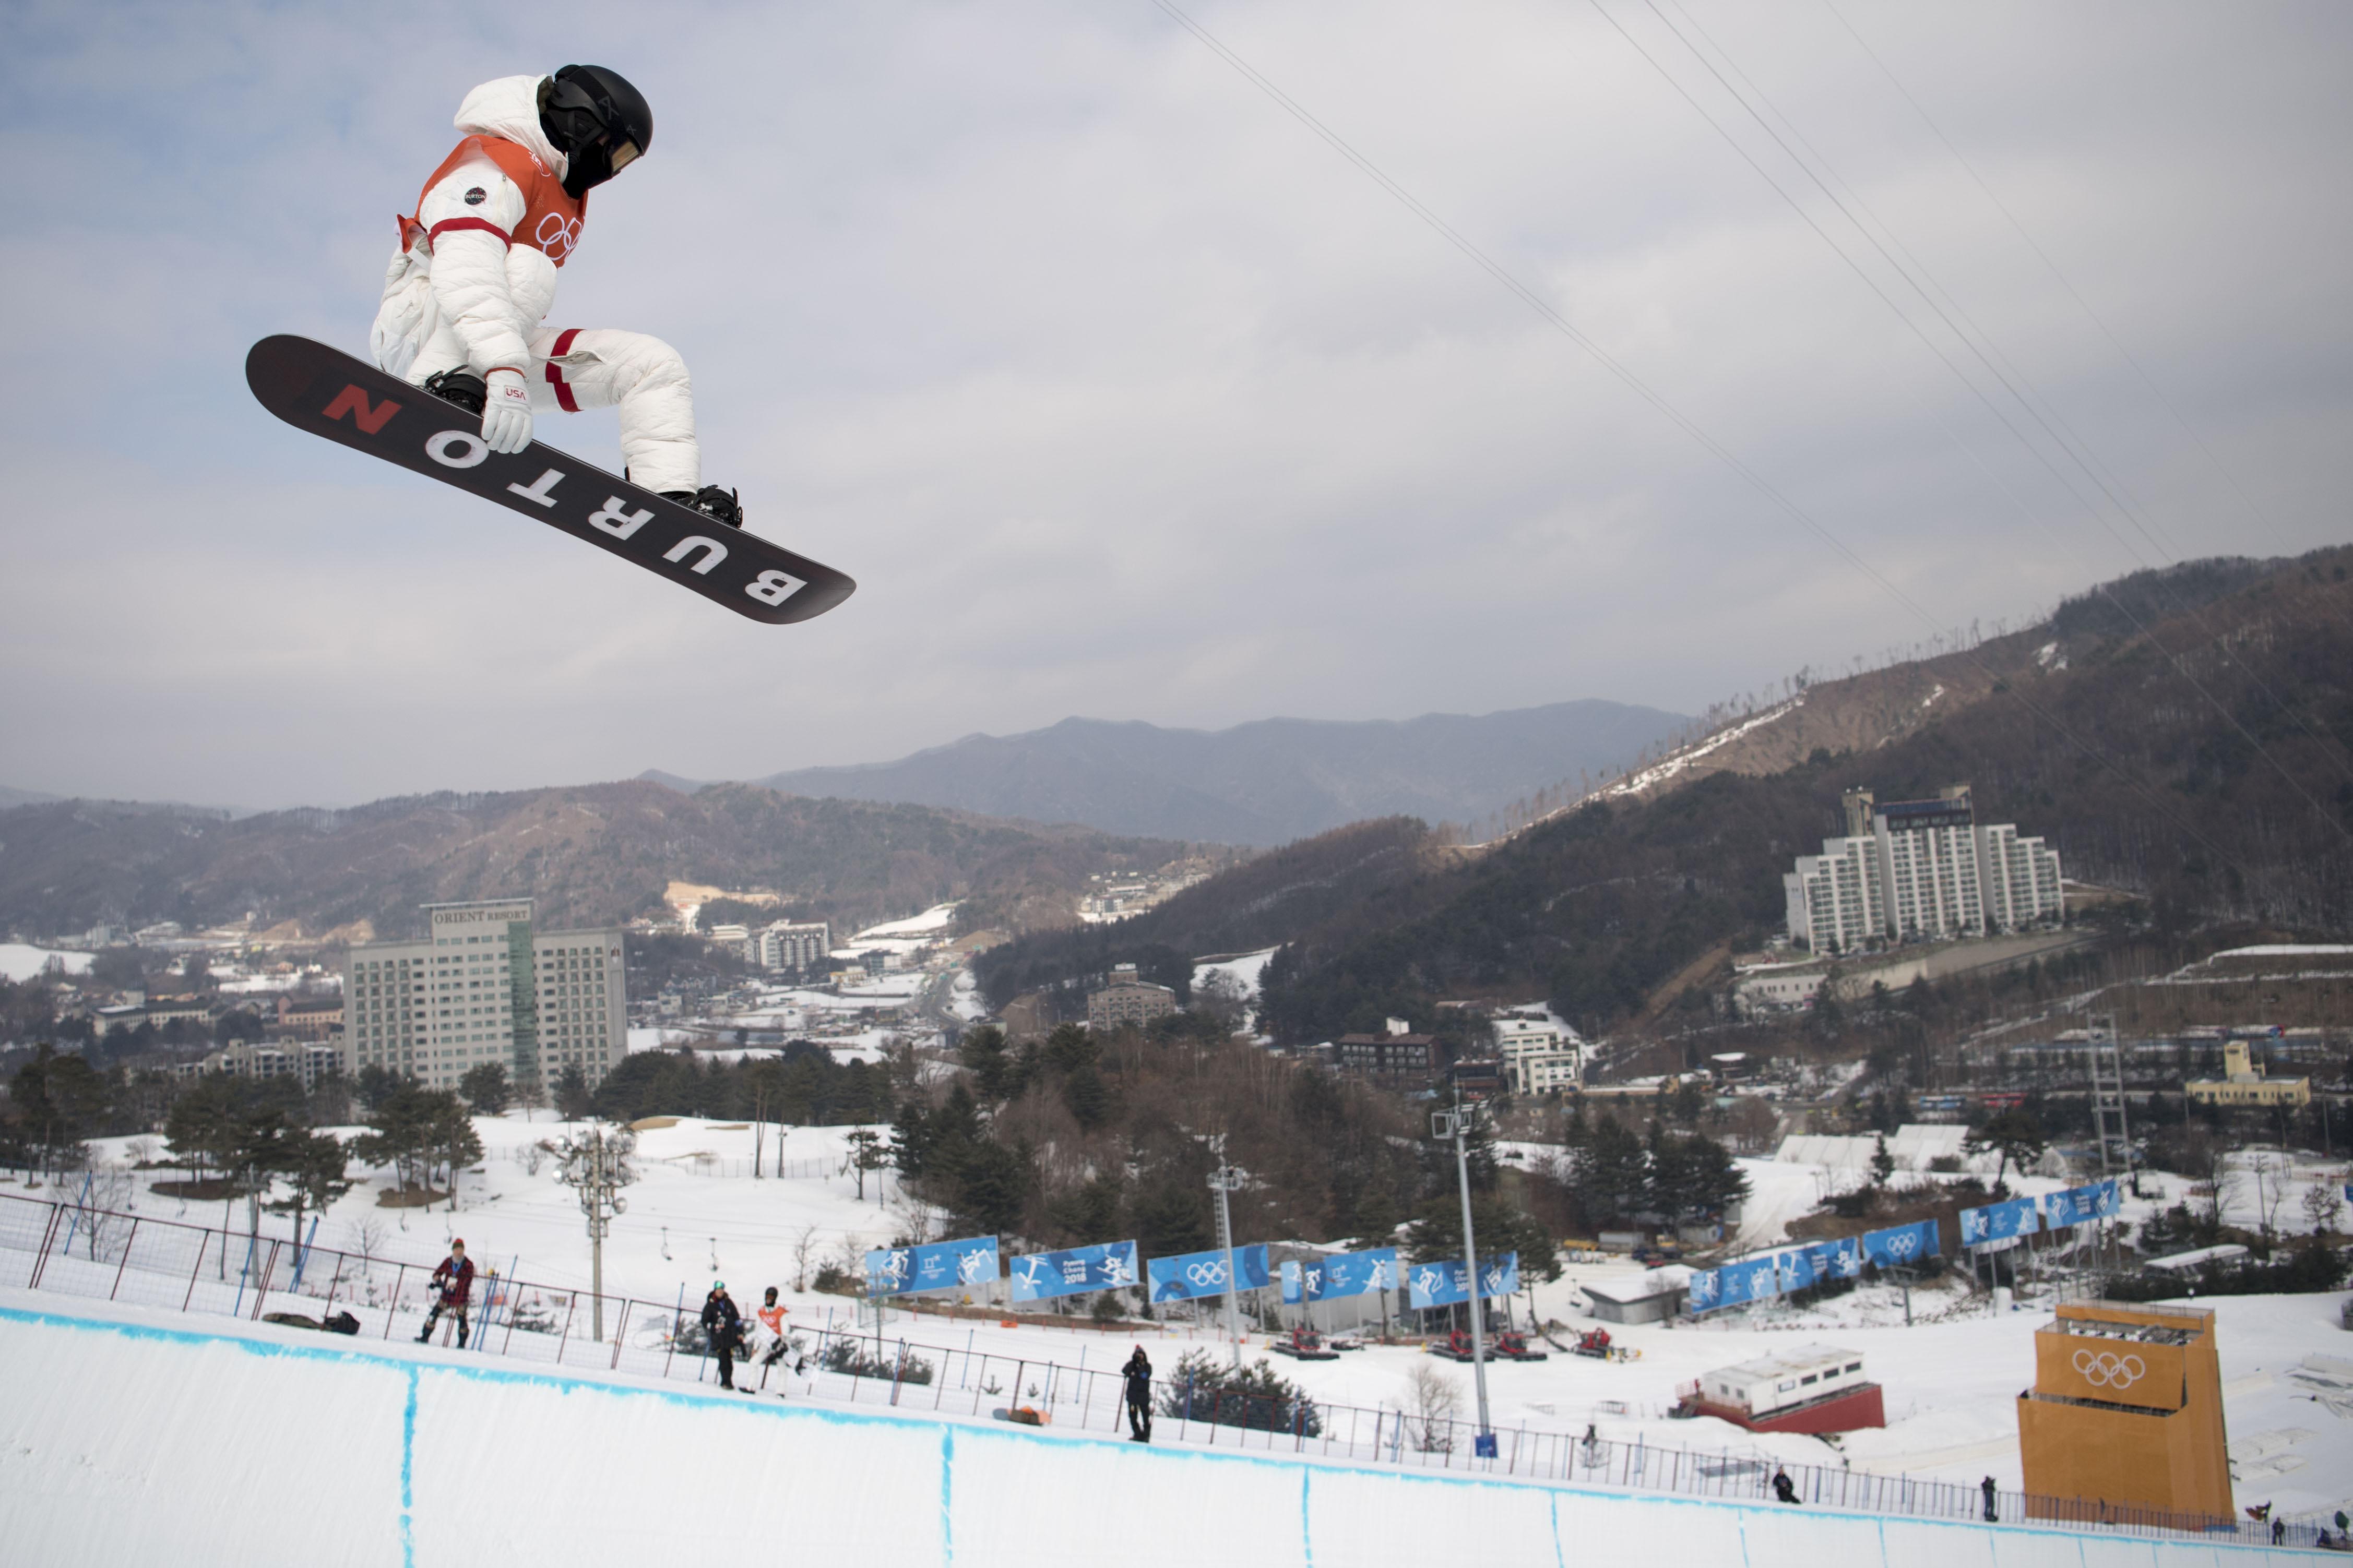 Shaun White Pyeongchang 2018 Olympic Winter Games